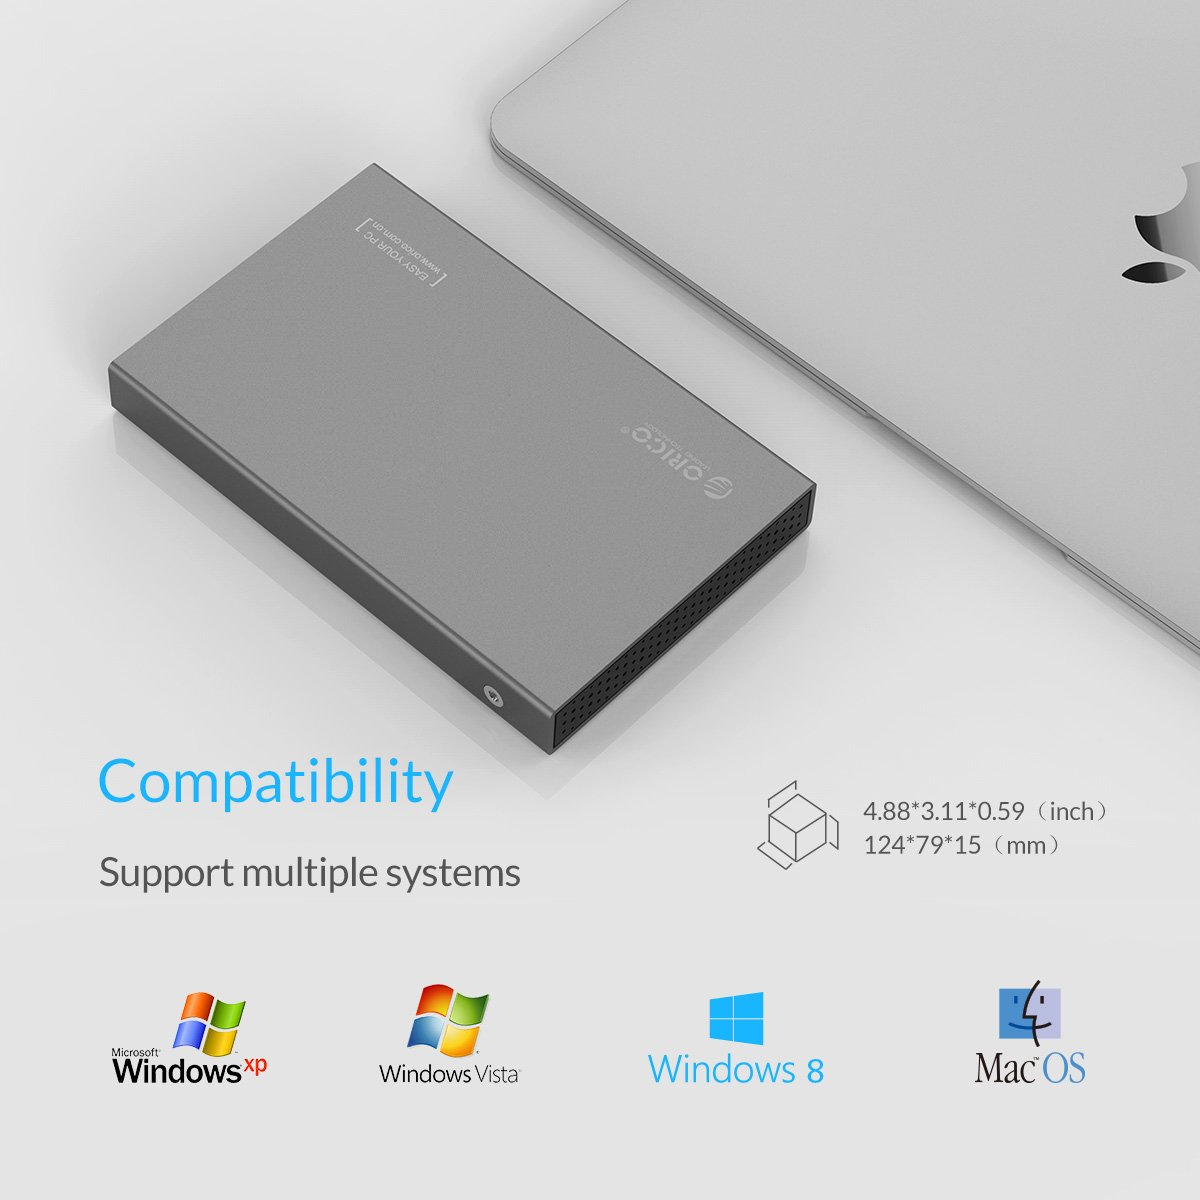 Aluminio Libre de Herramientas para HDD//SSD de 7//9,5mm,Soporta UASP Plata Carcasa para Discos Duros HDD de 2.5, indicador LED ORICO SATA I//II//III, USB 3.0